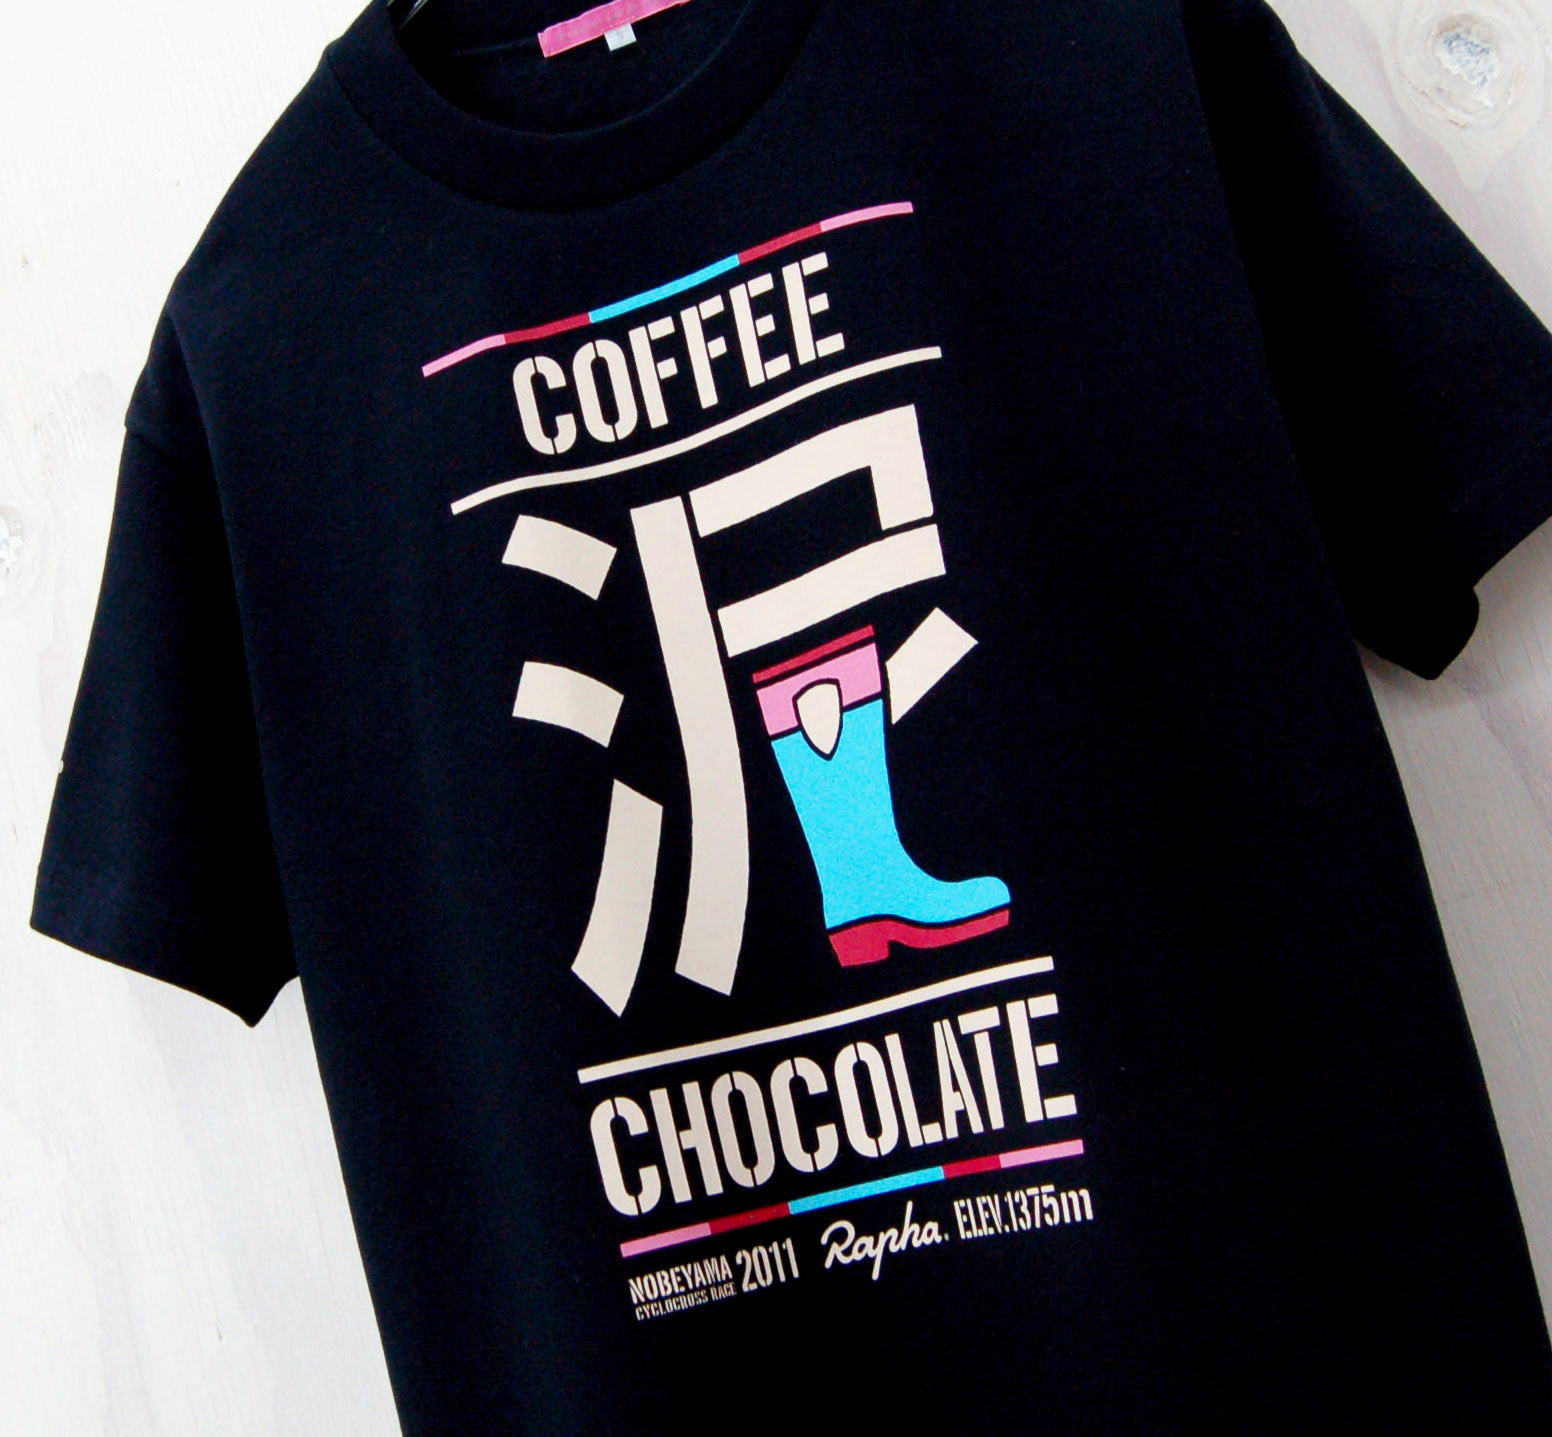 Rapha_nobeyama_tshirt_02.jpg